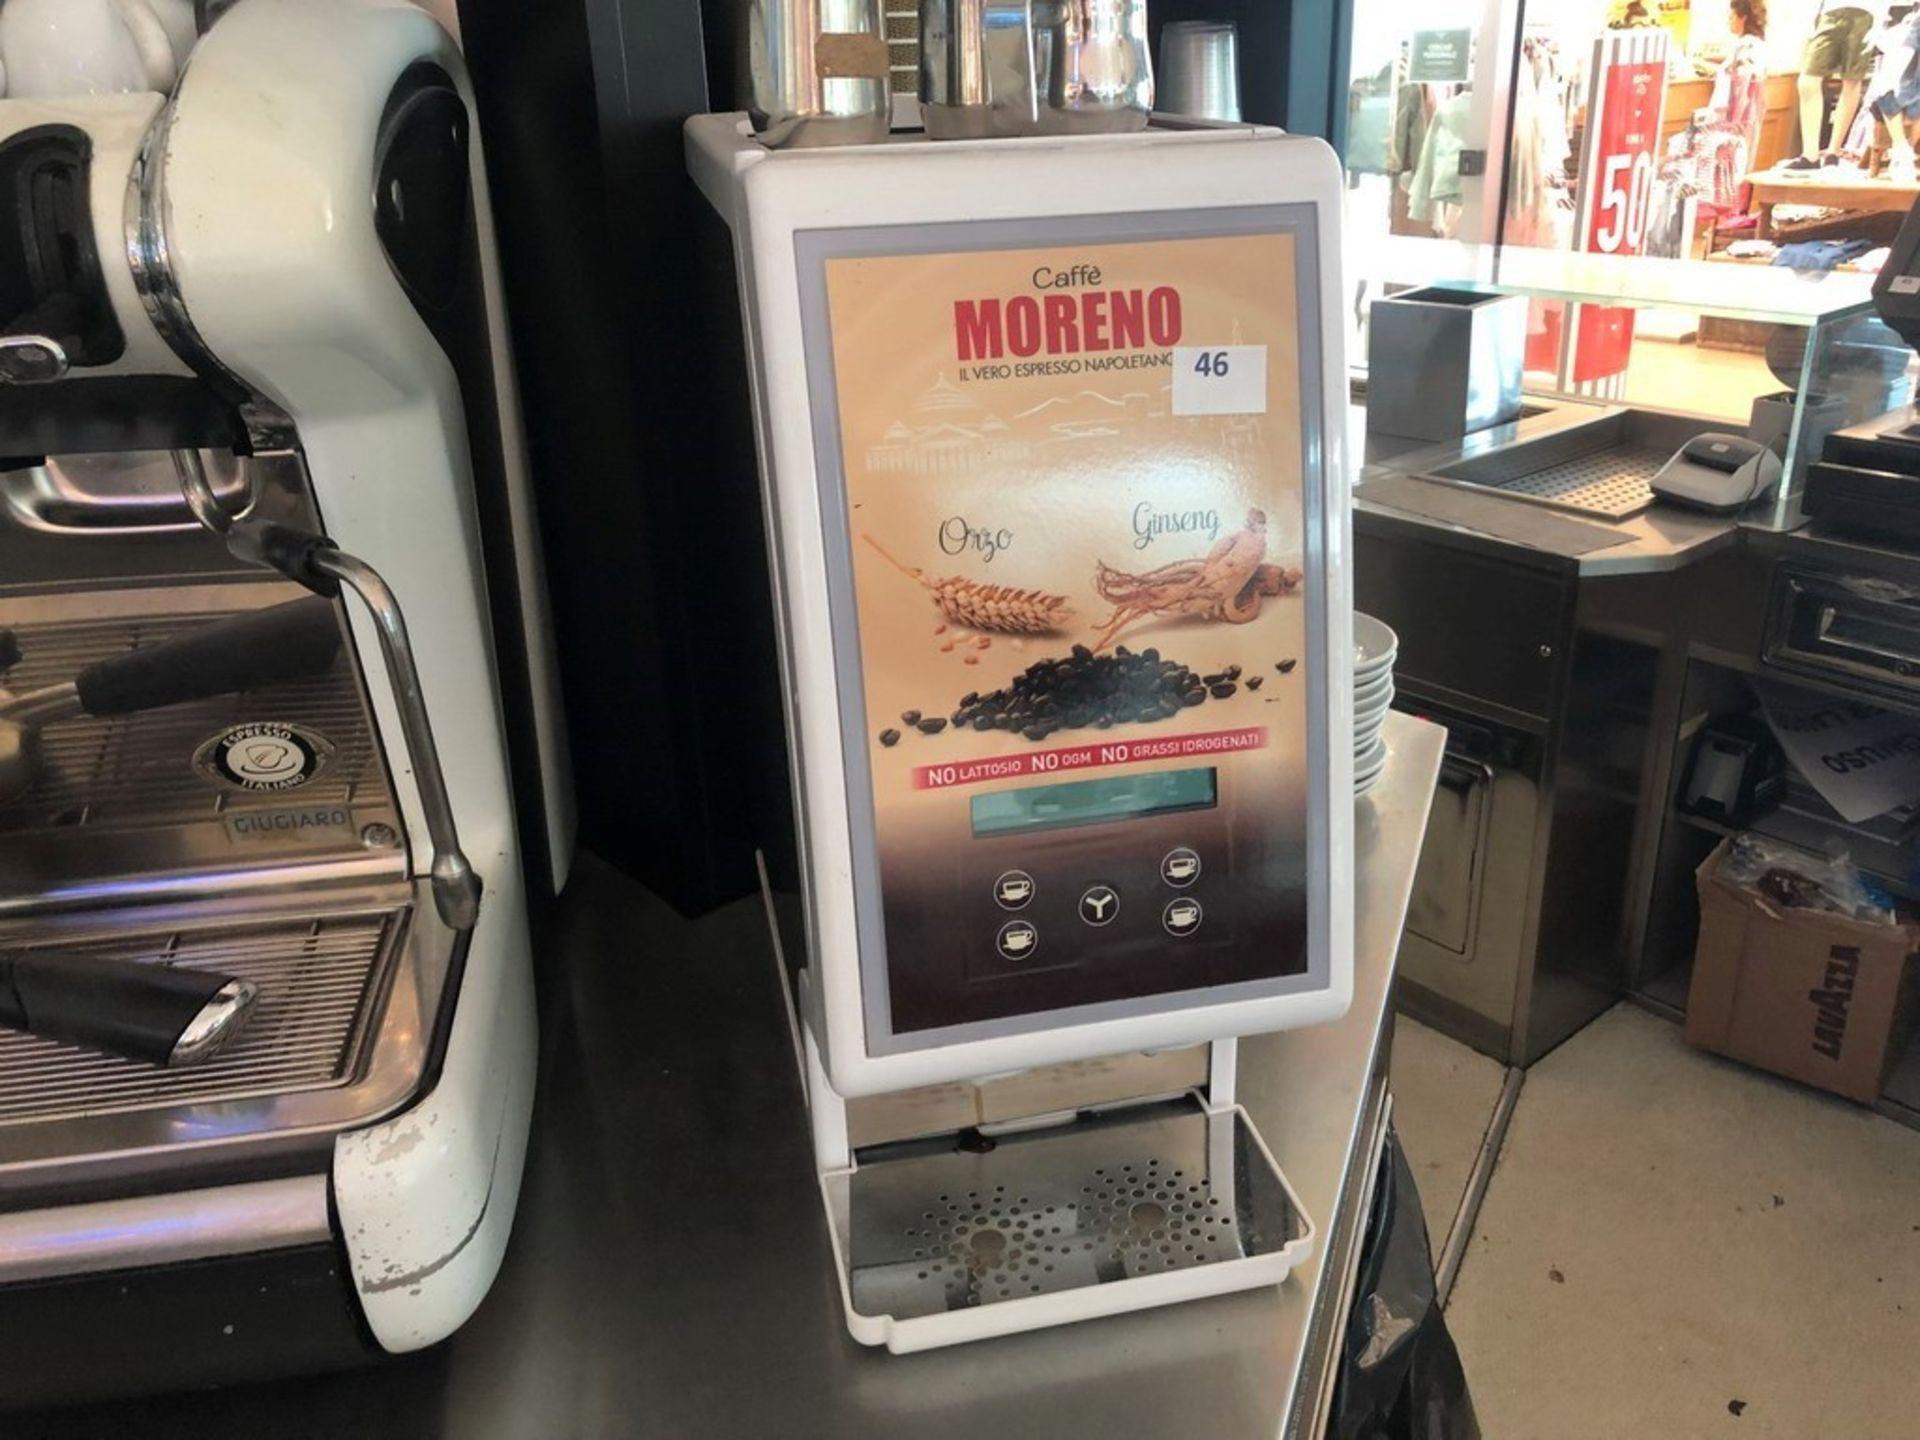 Lotto 48 - N. 46 (FALL. N. 102/19 VR) MACCHINA PER CAFFE' ORZO E GINSENG